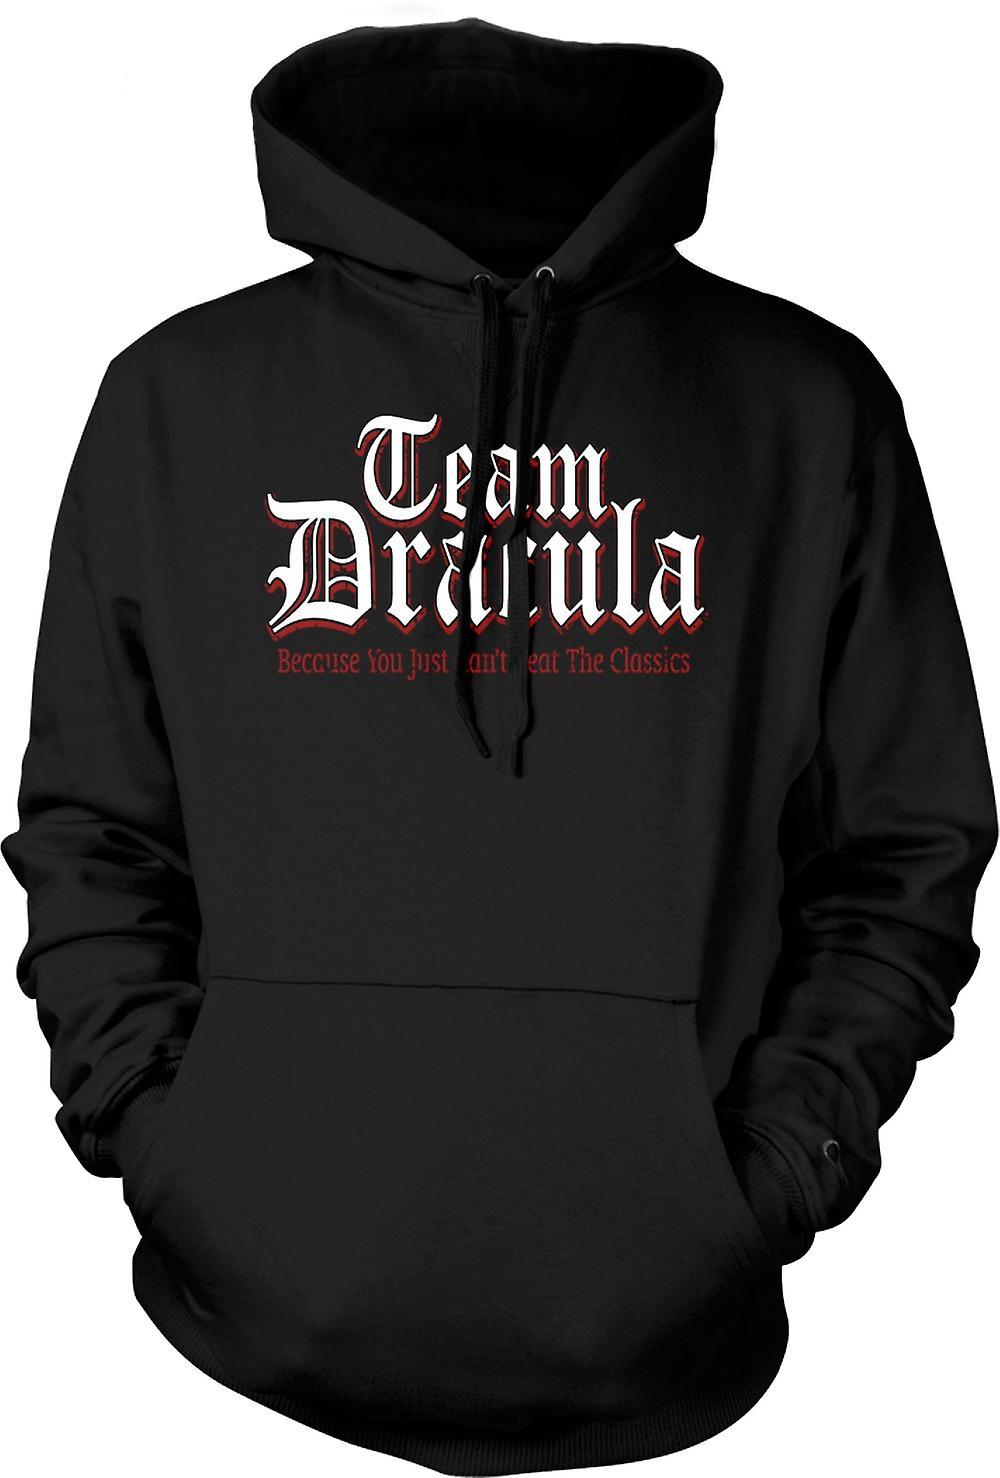 Para hombre con capucha - equipo Drácula - gracioso